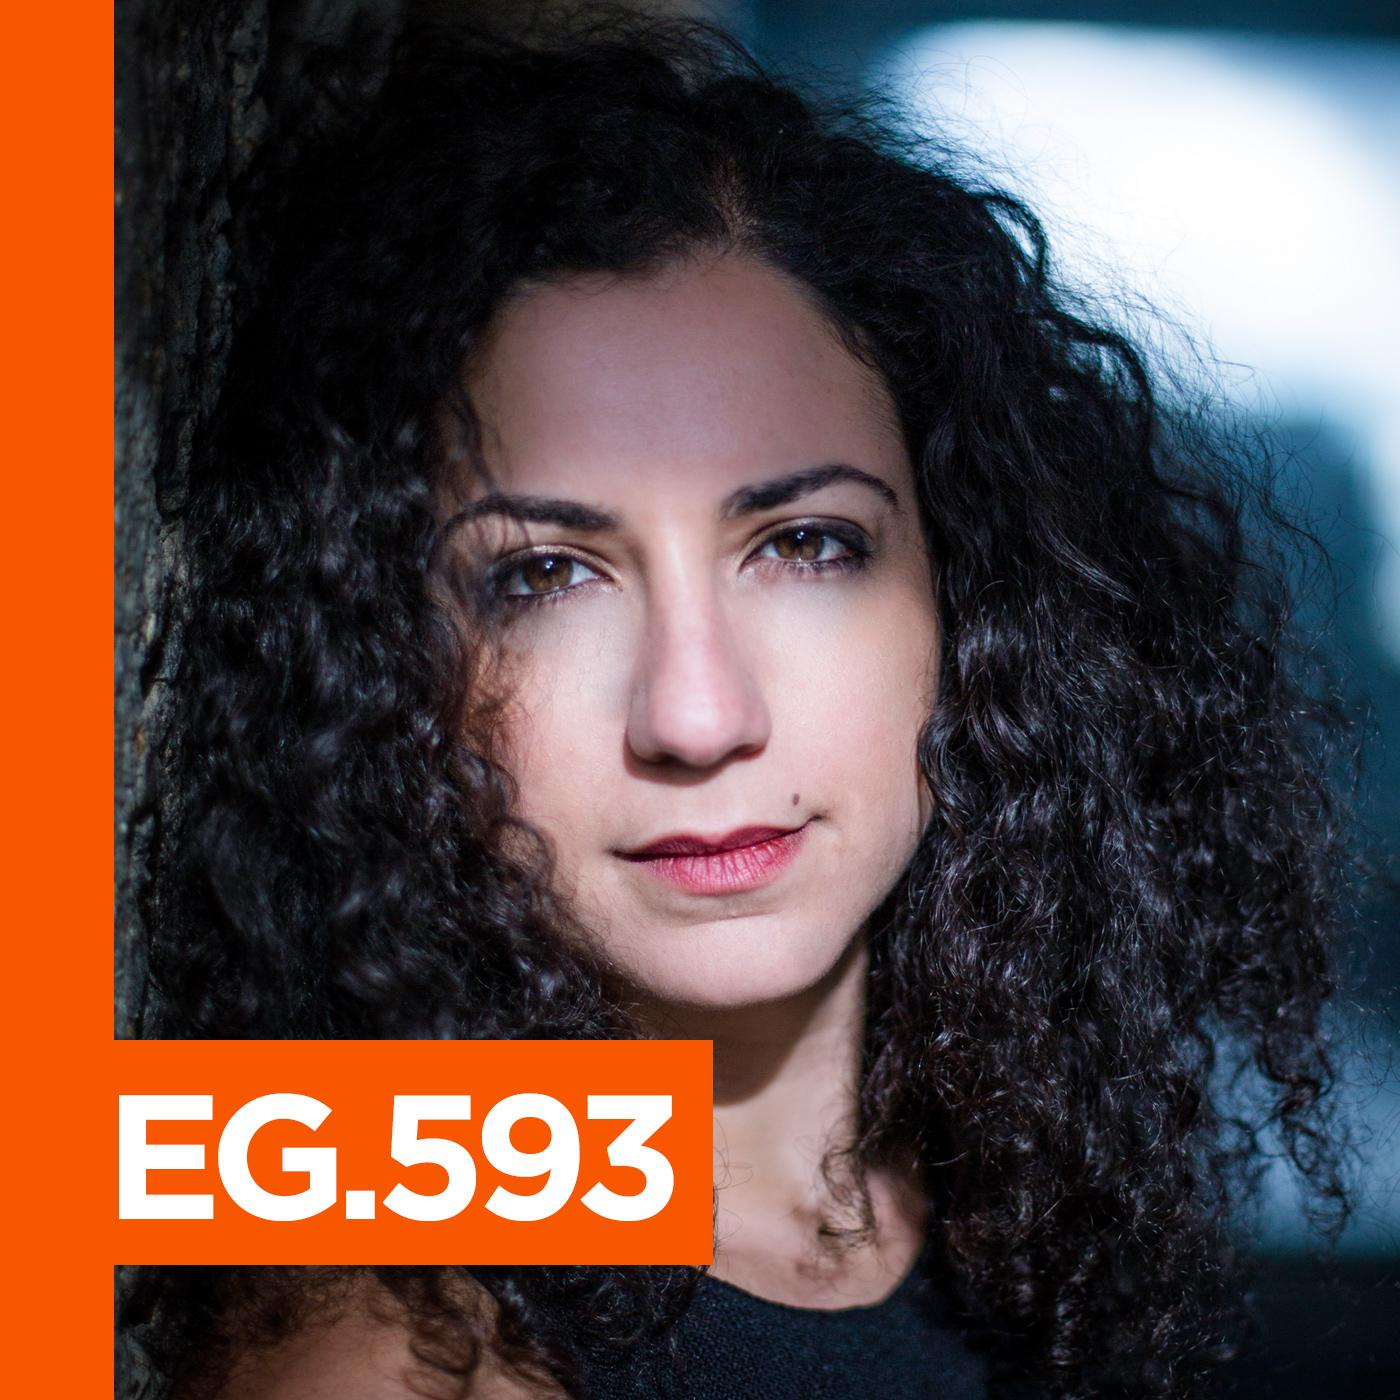 EG.593 Qash